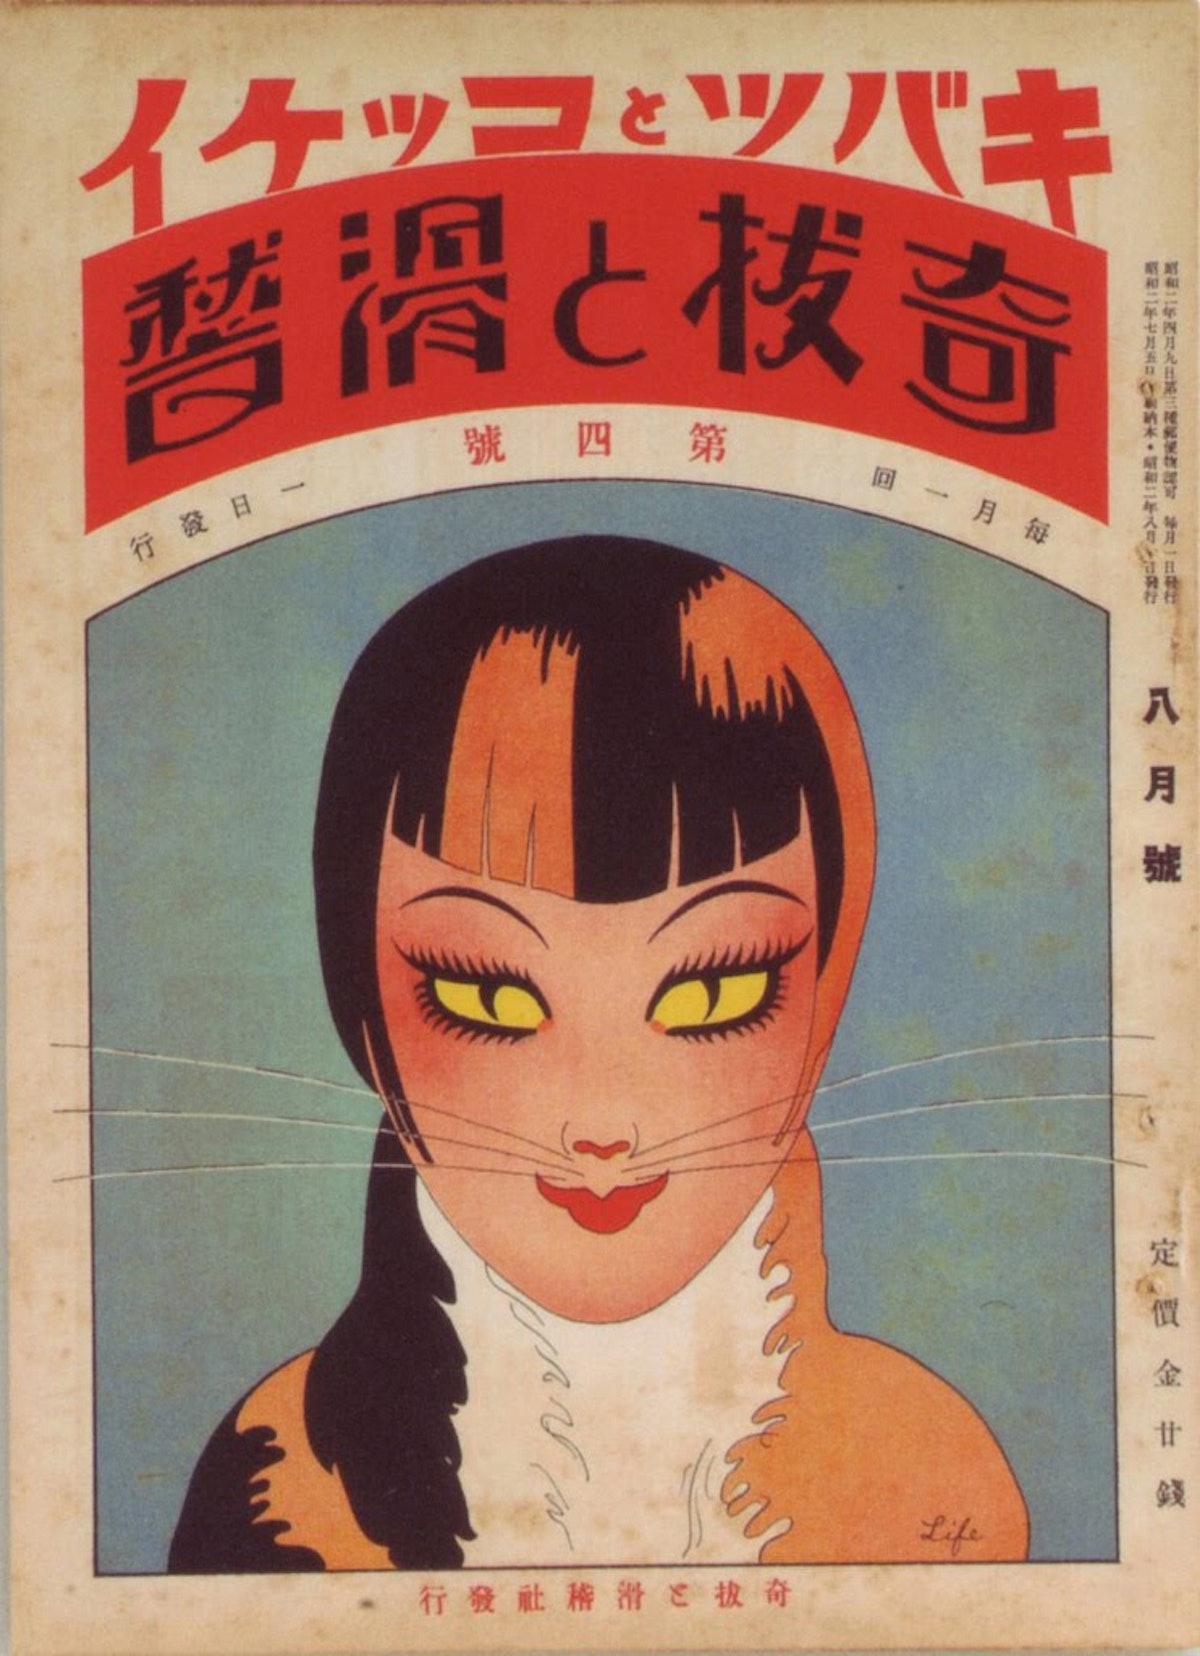 Japanese 1927 magazine cover